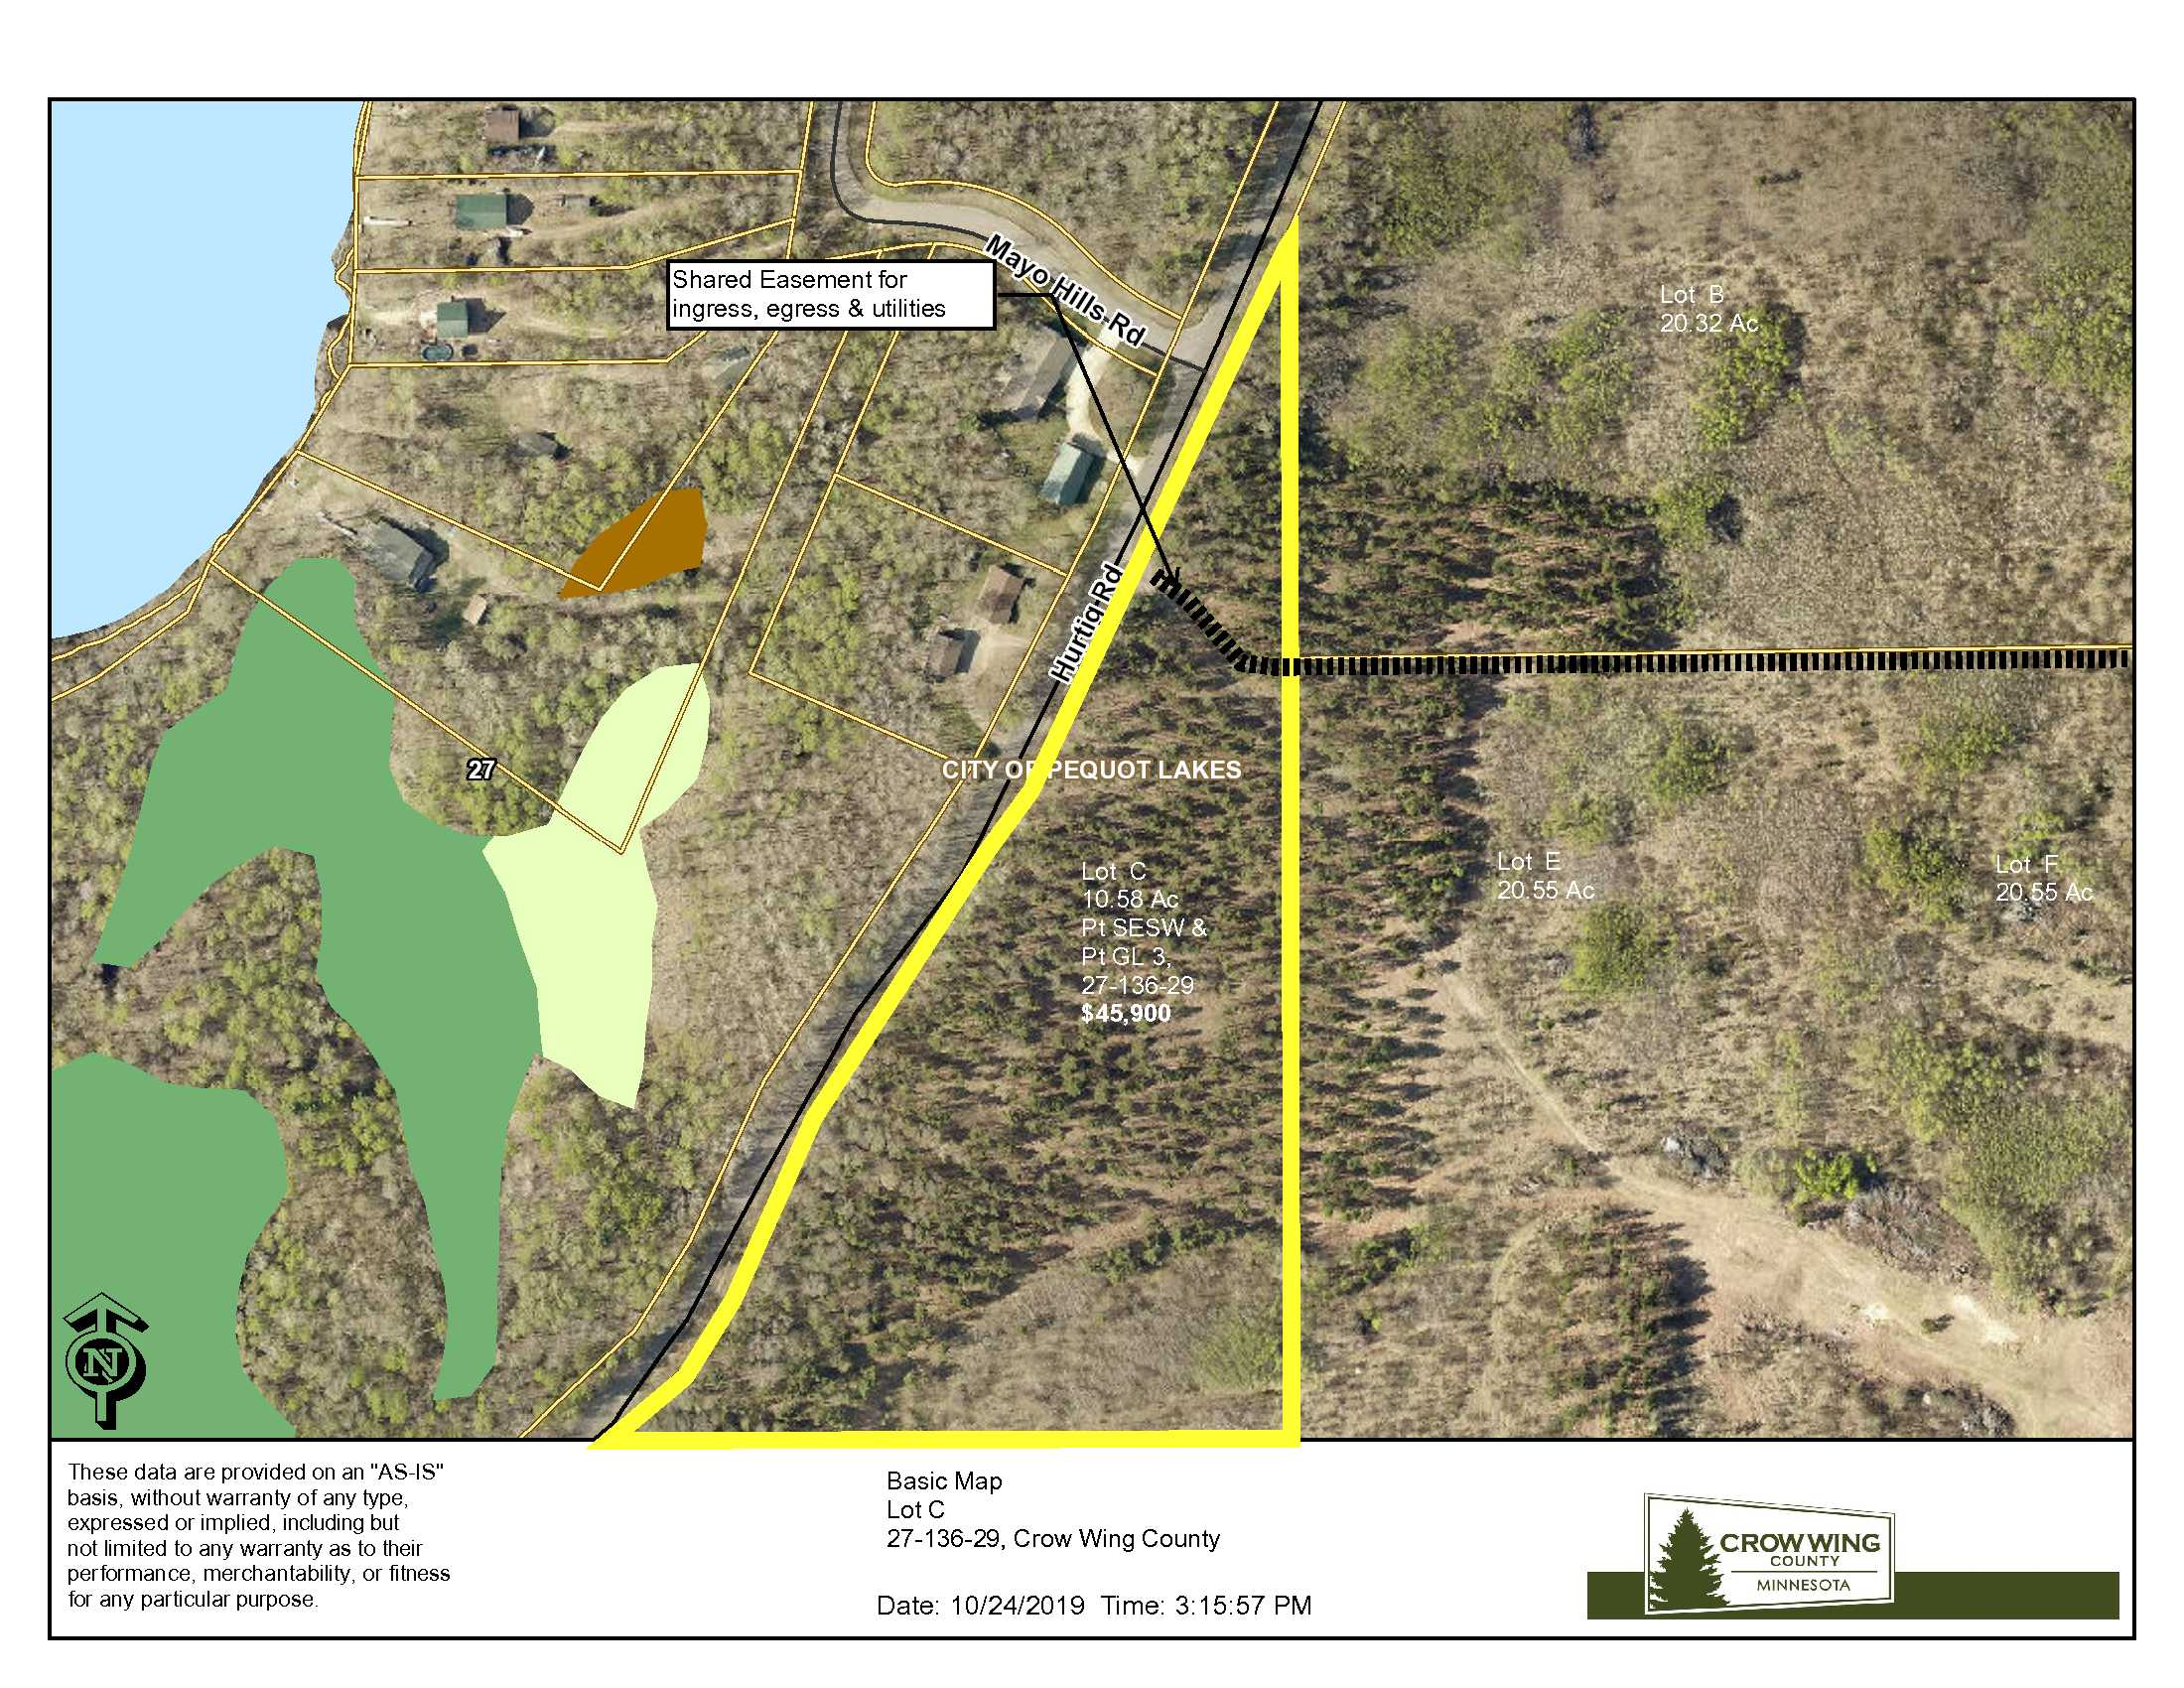 Lot C, 27-136-29, Hurtig Rd, Pequot Lakes, Crow Wing Co